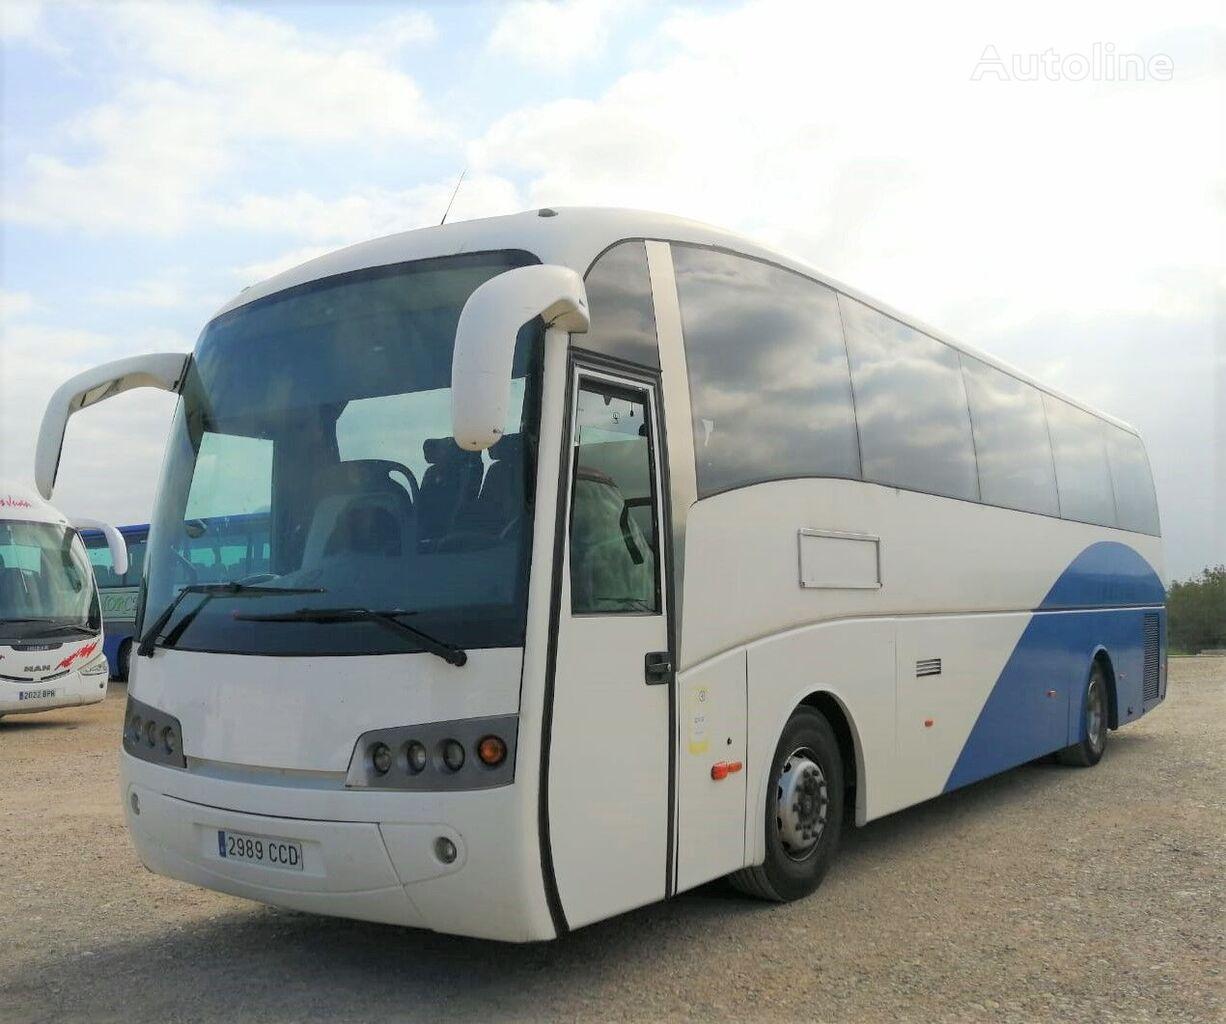 الباص السياحي IVECO  EURORIDER D-43 SRI - SIDERAL +430 CV +WC